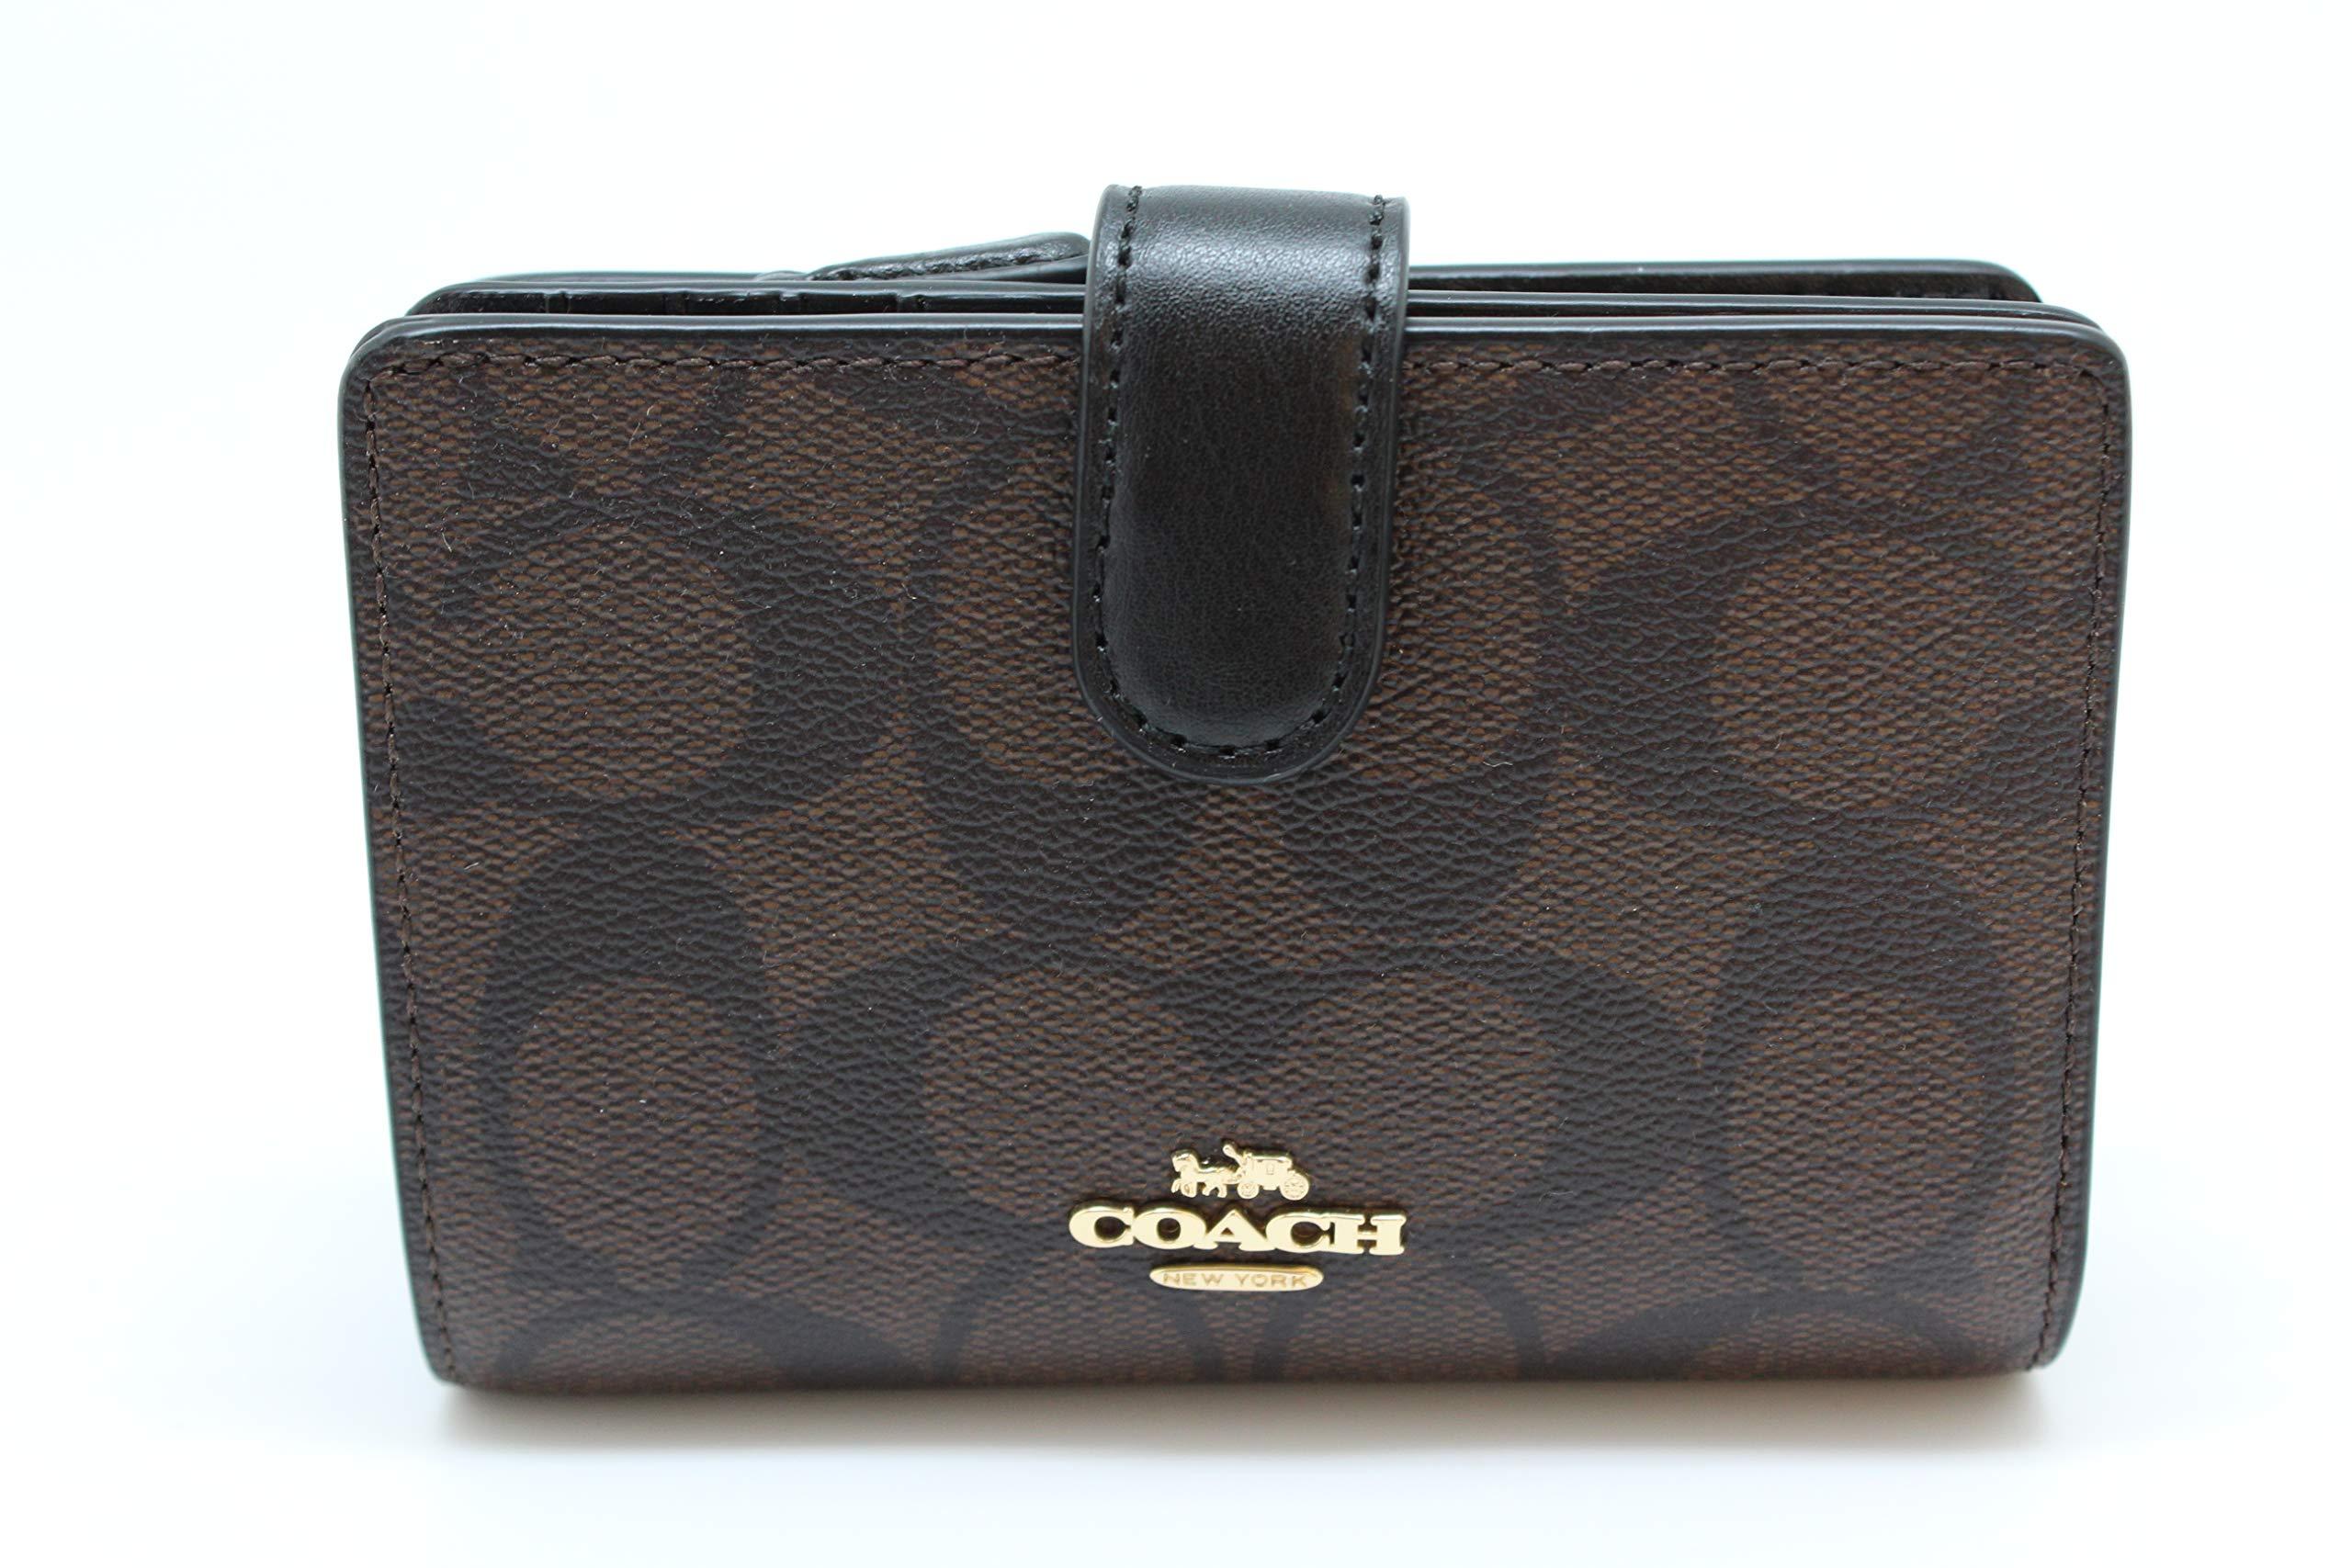 Coach PVC Medium Corner Zip Wallet Signature Brown Black 3173, Small